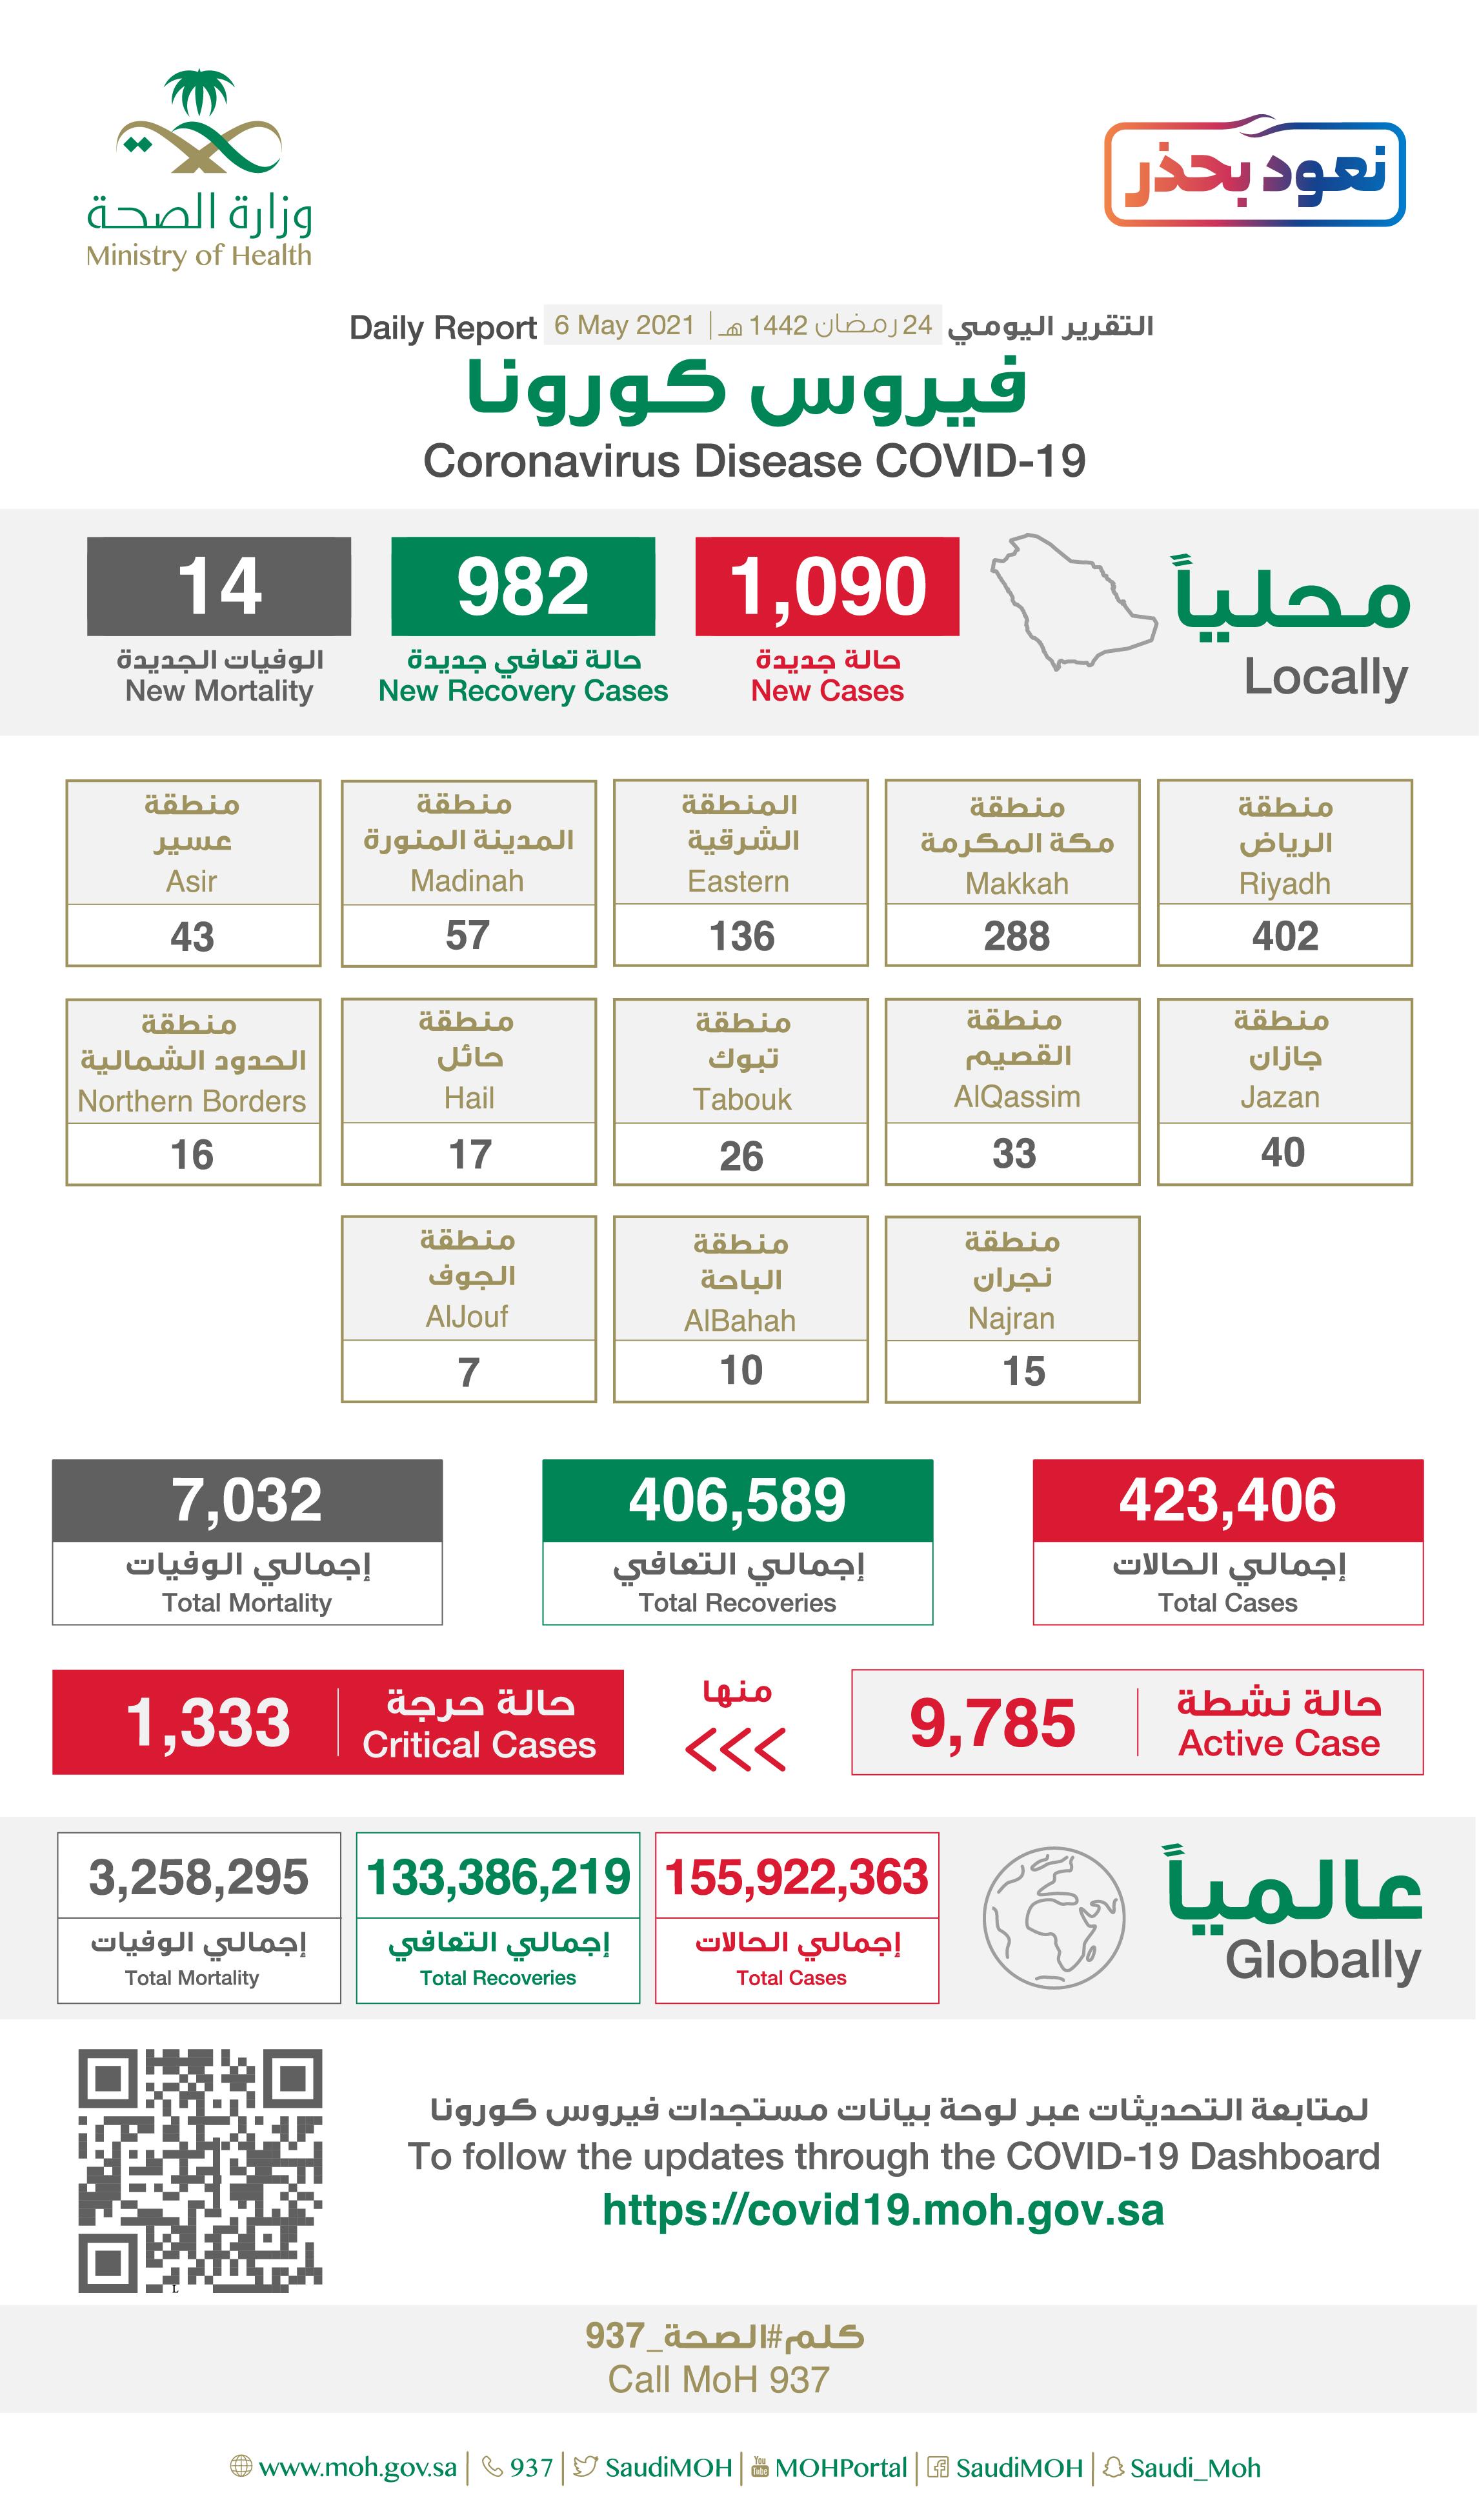 Saudi Arabia Coronavirus : Total Cases :423,406 , New Cases : 1,090 , Cured : 406,589 , Deaths: 7,032, Active Cases : 9,785